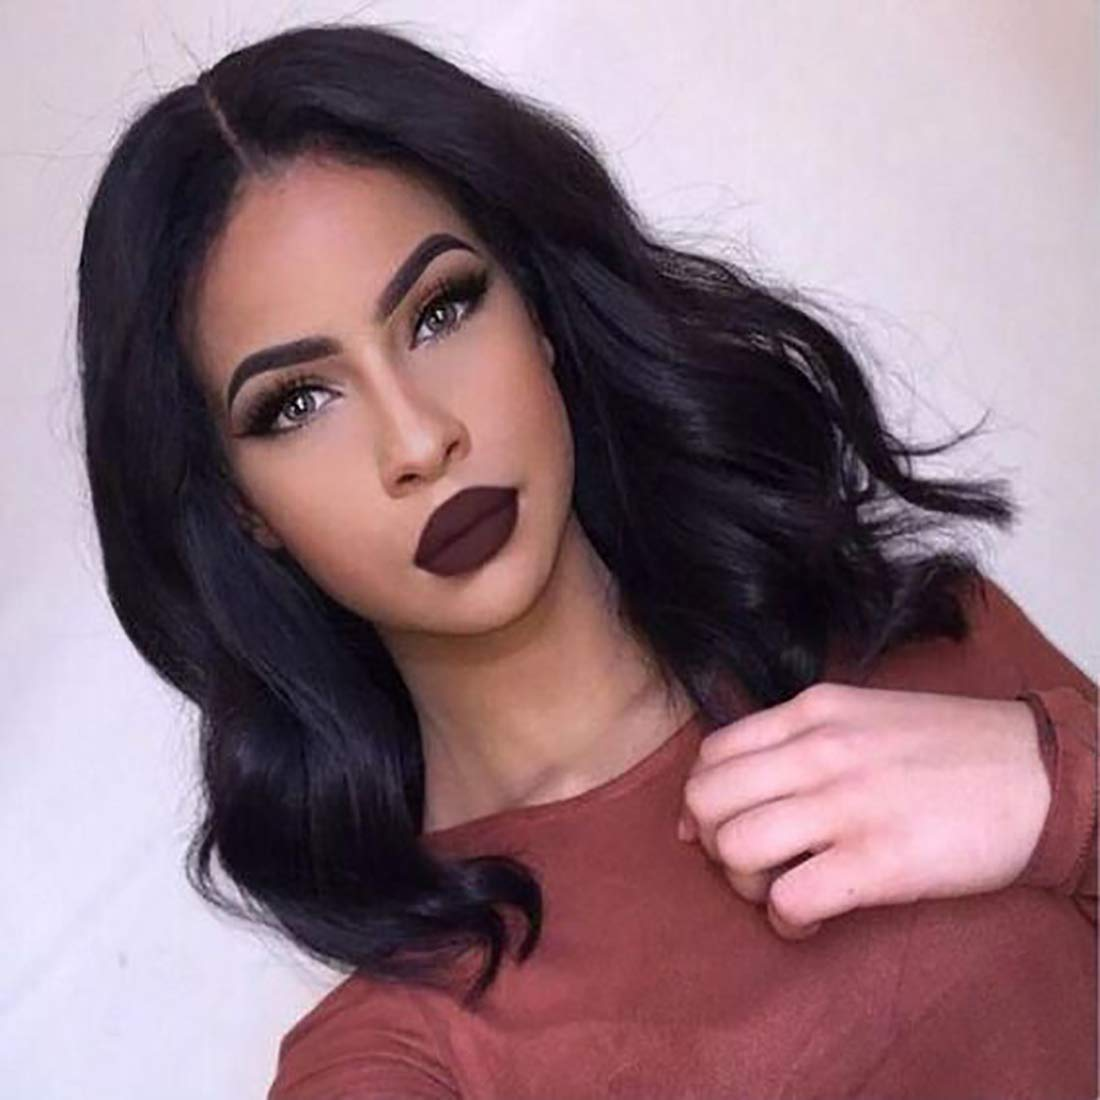 Brazilian Virgin Human Hair Lace Front Wigs Glueless Short Bob Human Hair Wigs Natural Wavy Hair For Black Women 12inch Short Wavy Lace Wigs by Amanda